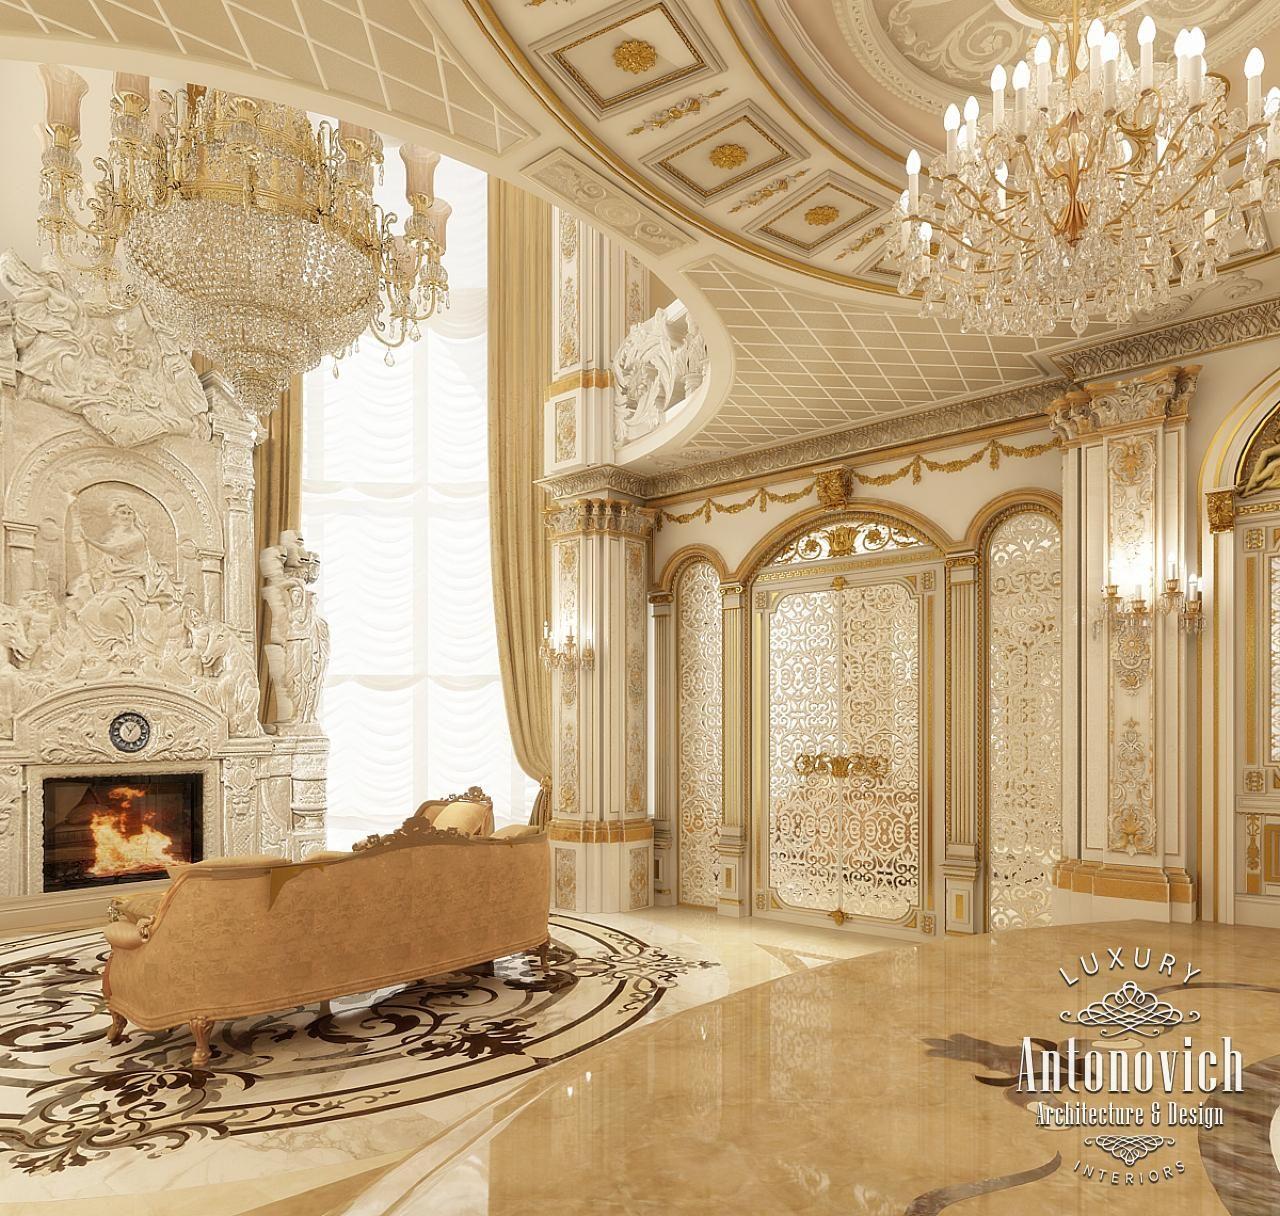 Bedroom Design Private Palace: Private Palace Dubai Interior Design